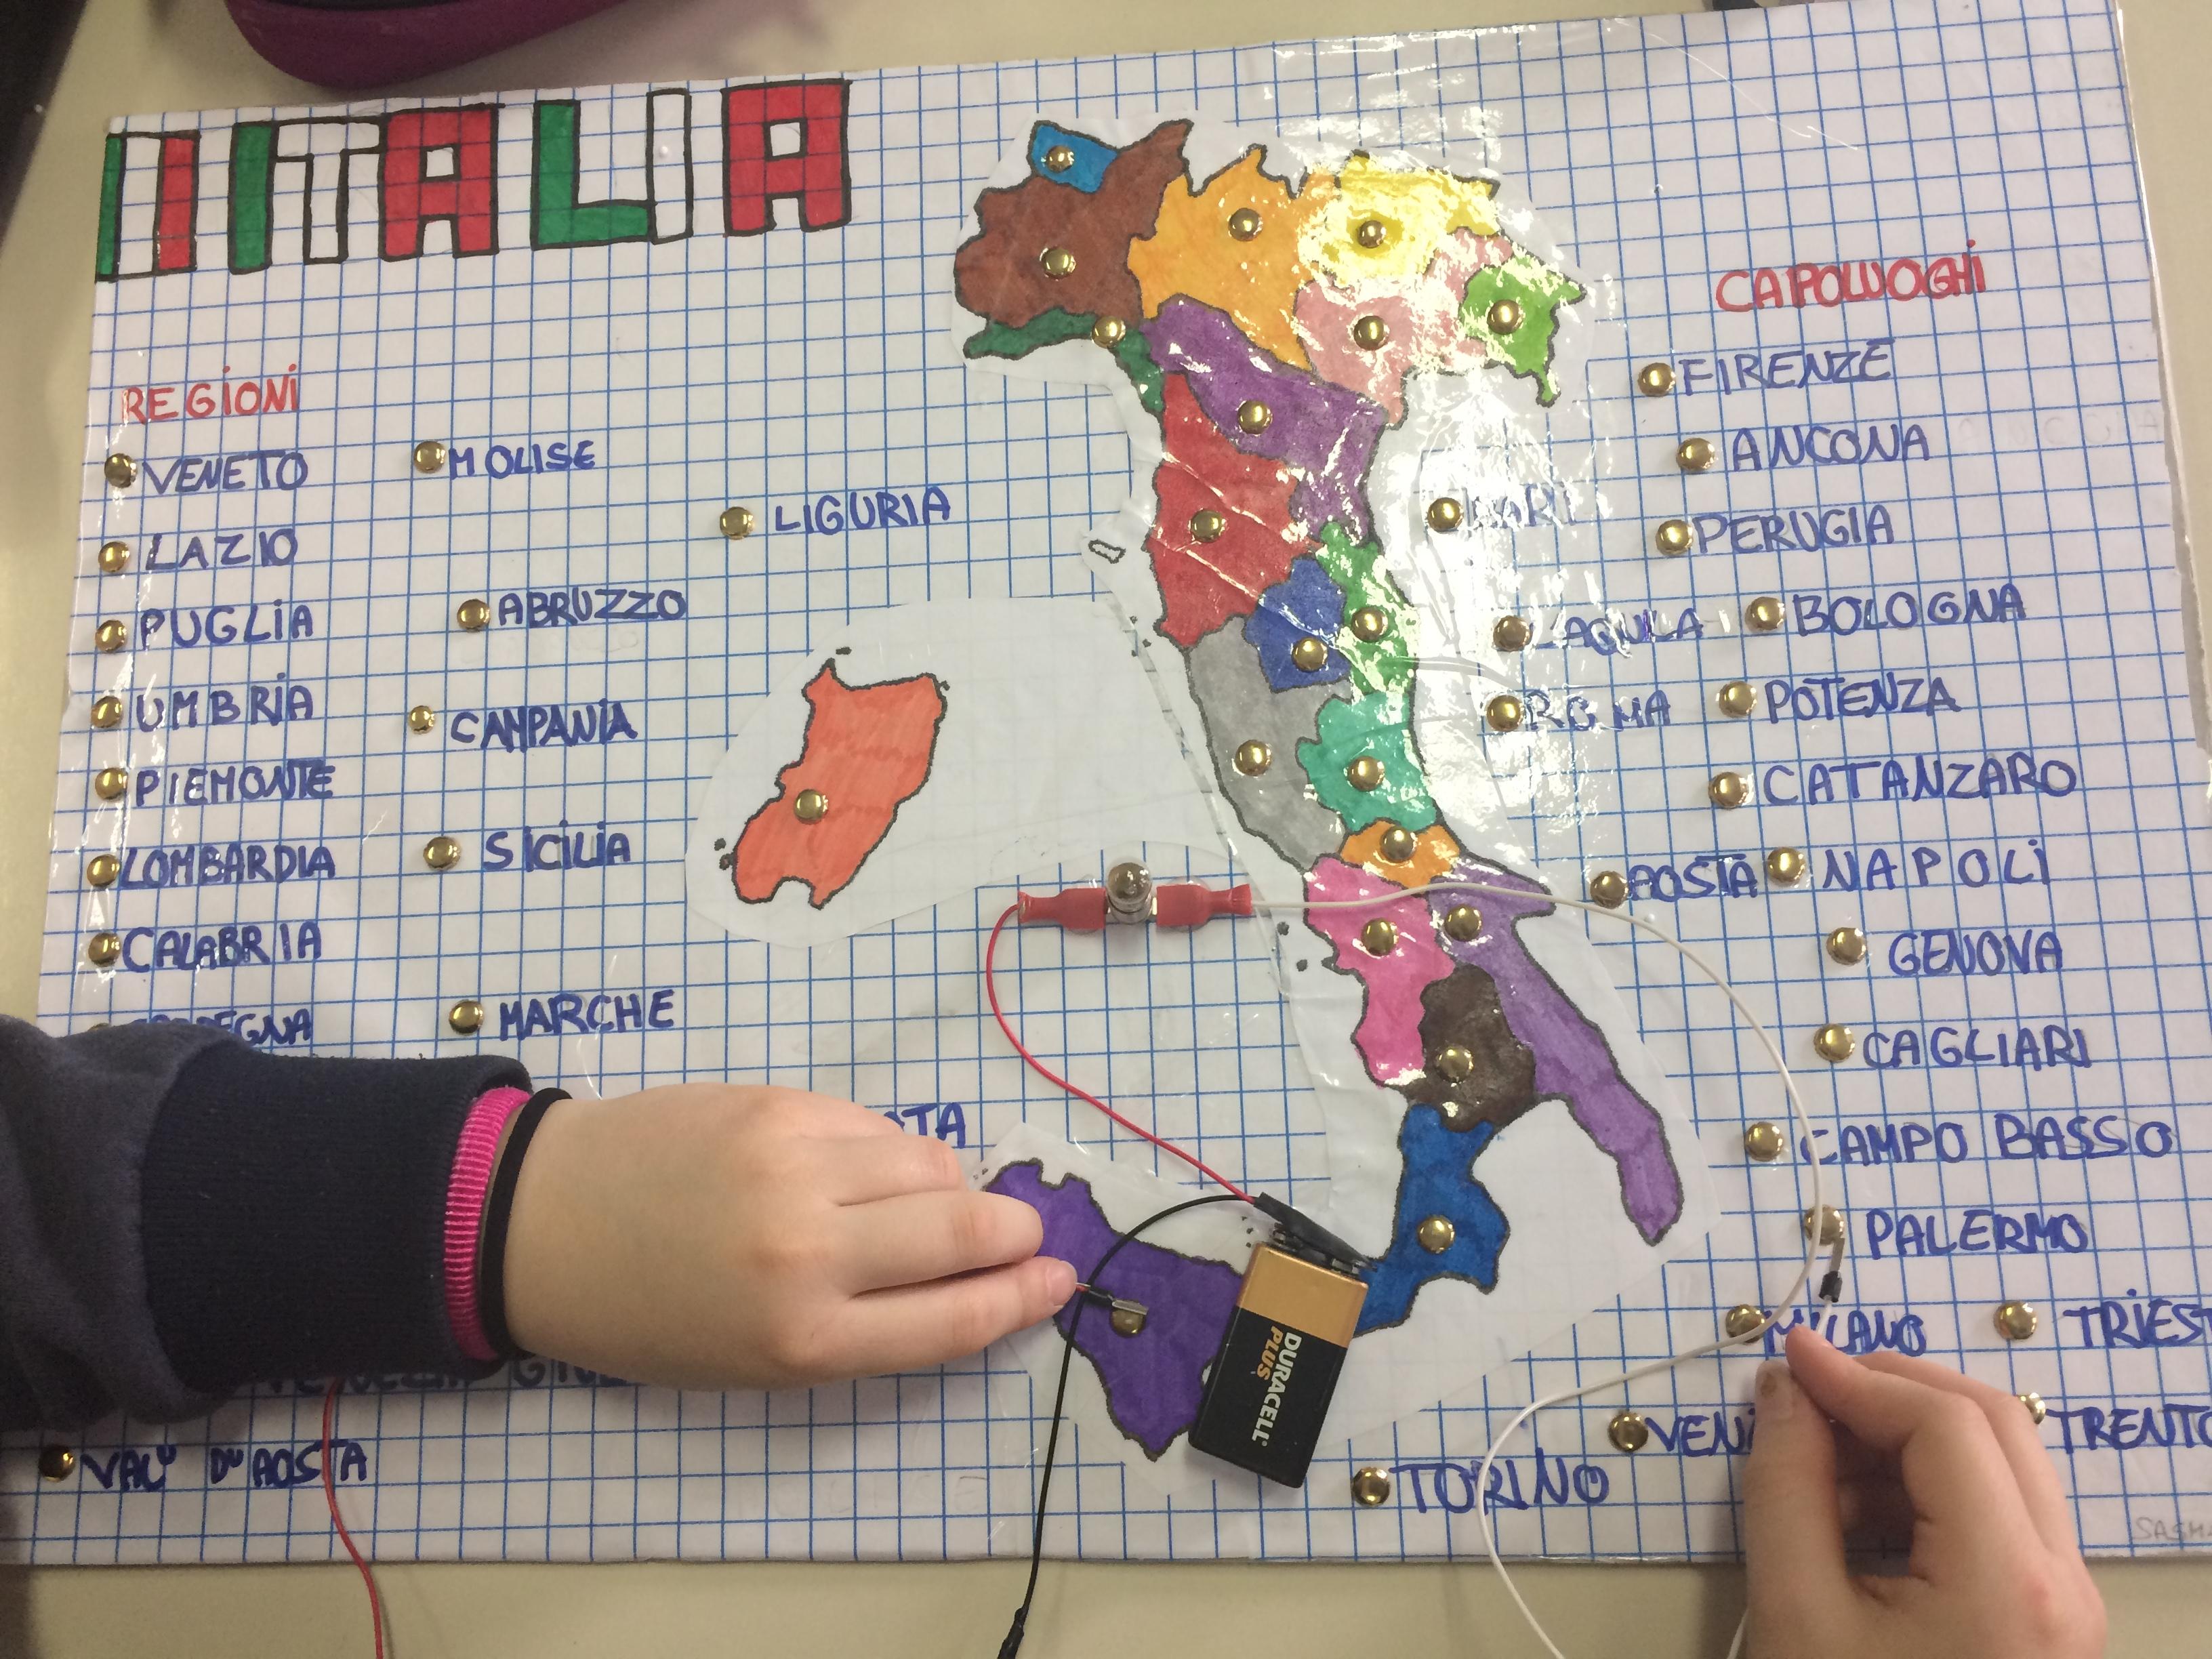 Sapientino Regioni E Capoluoghi Classe 5a Maestramarta